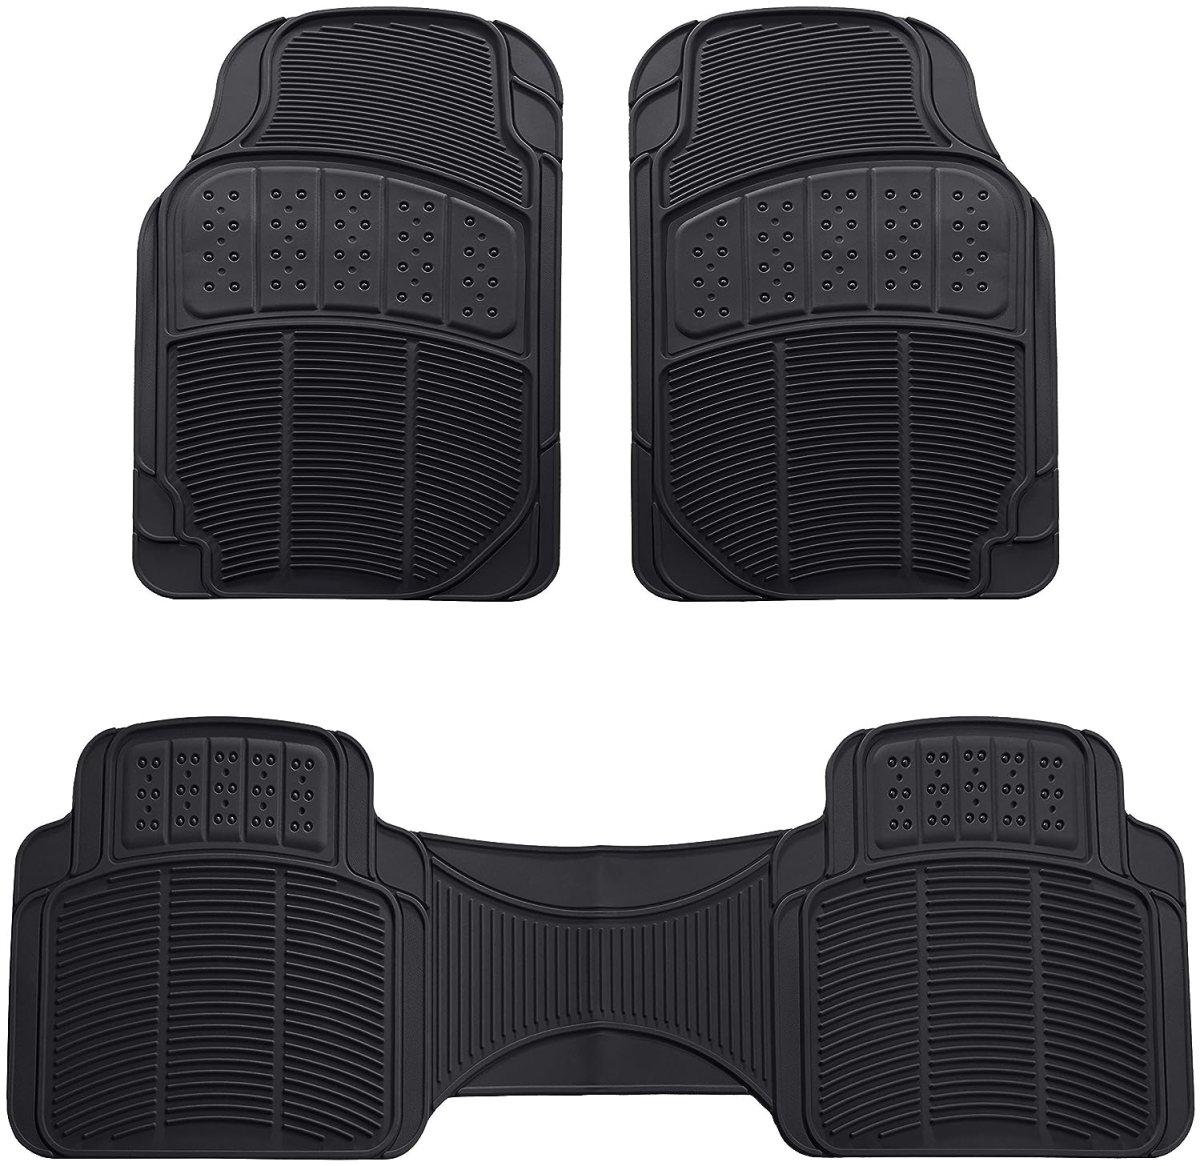 Best Floor Mats Reviews AmazonBasics 3 Piece Car Floor Mat, Black